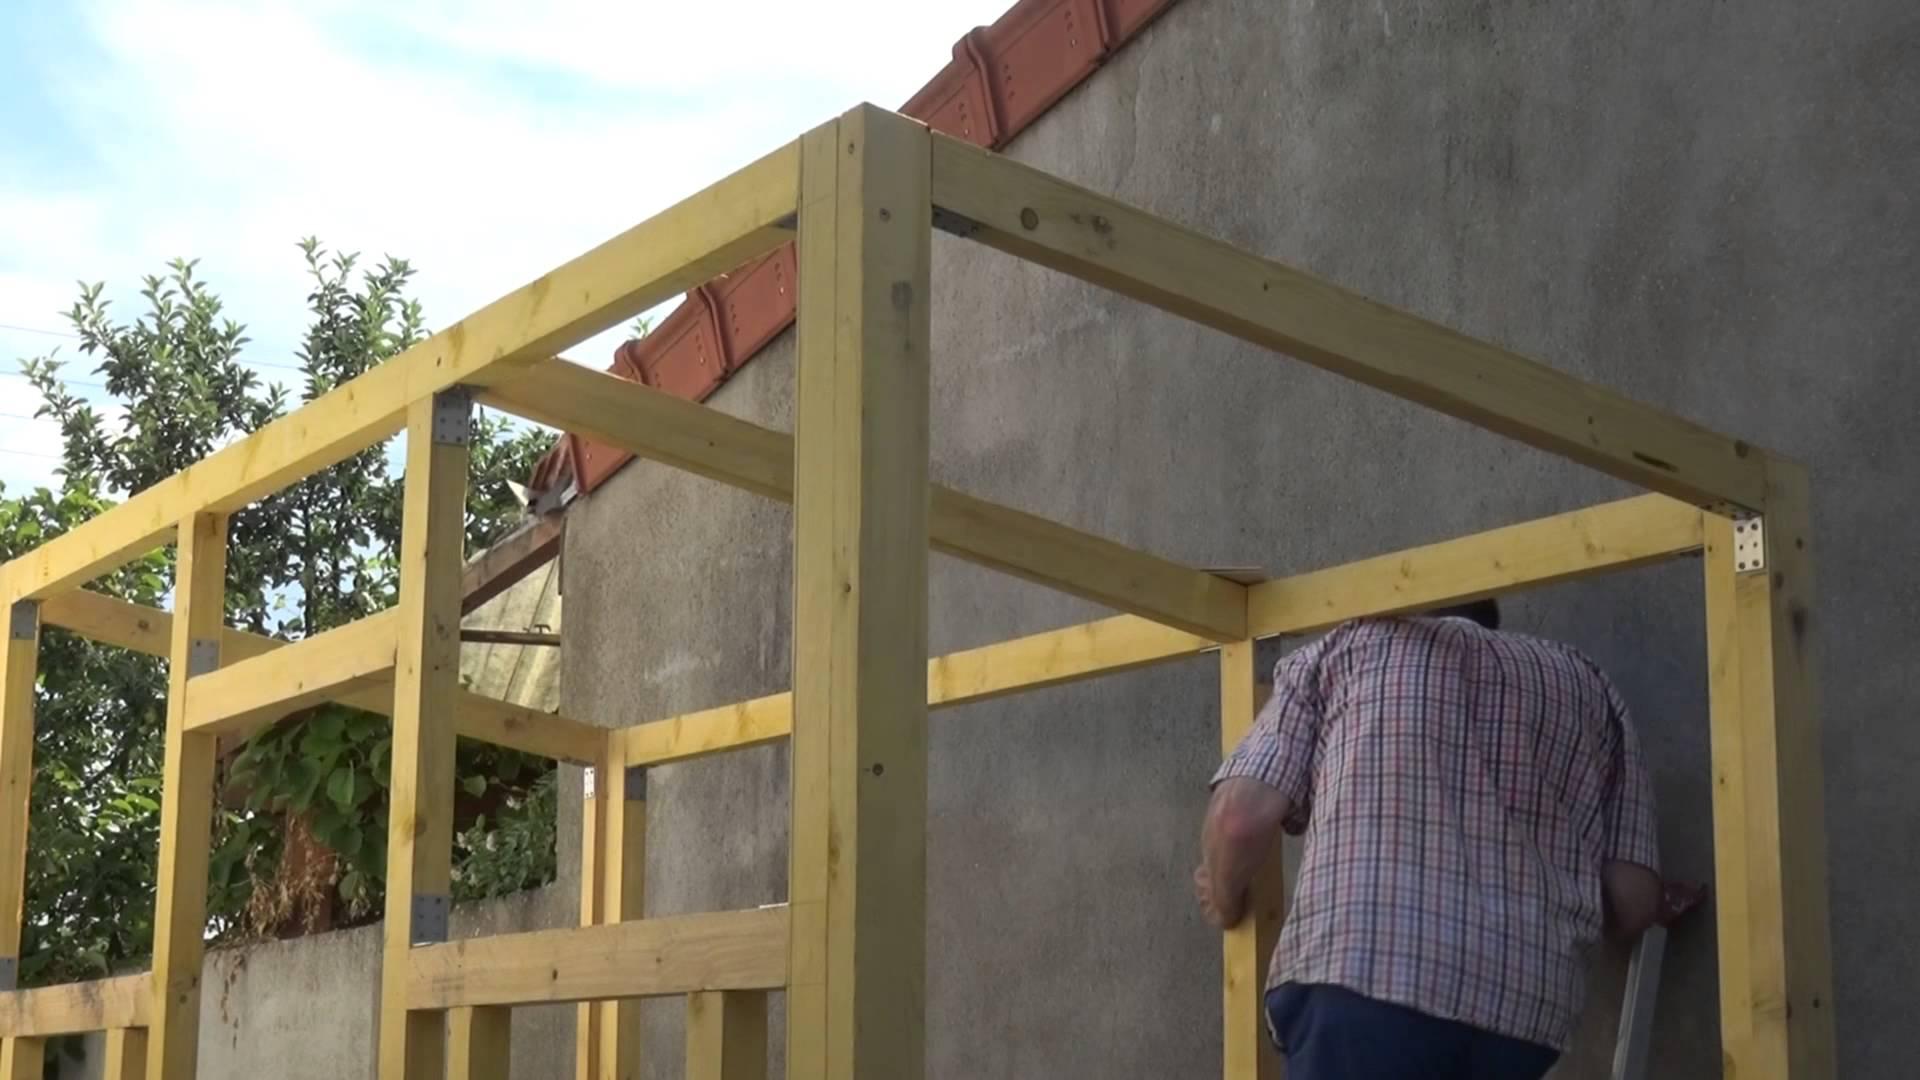 Construire Abri De Jardin Des Idées - Idees Conception Jardin concernant Construire Une Cabane De Jardin